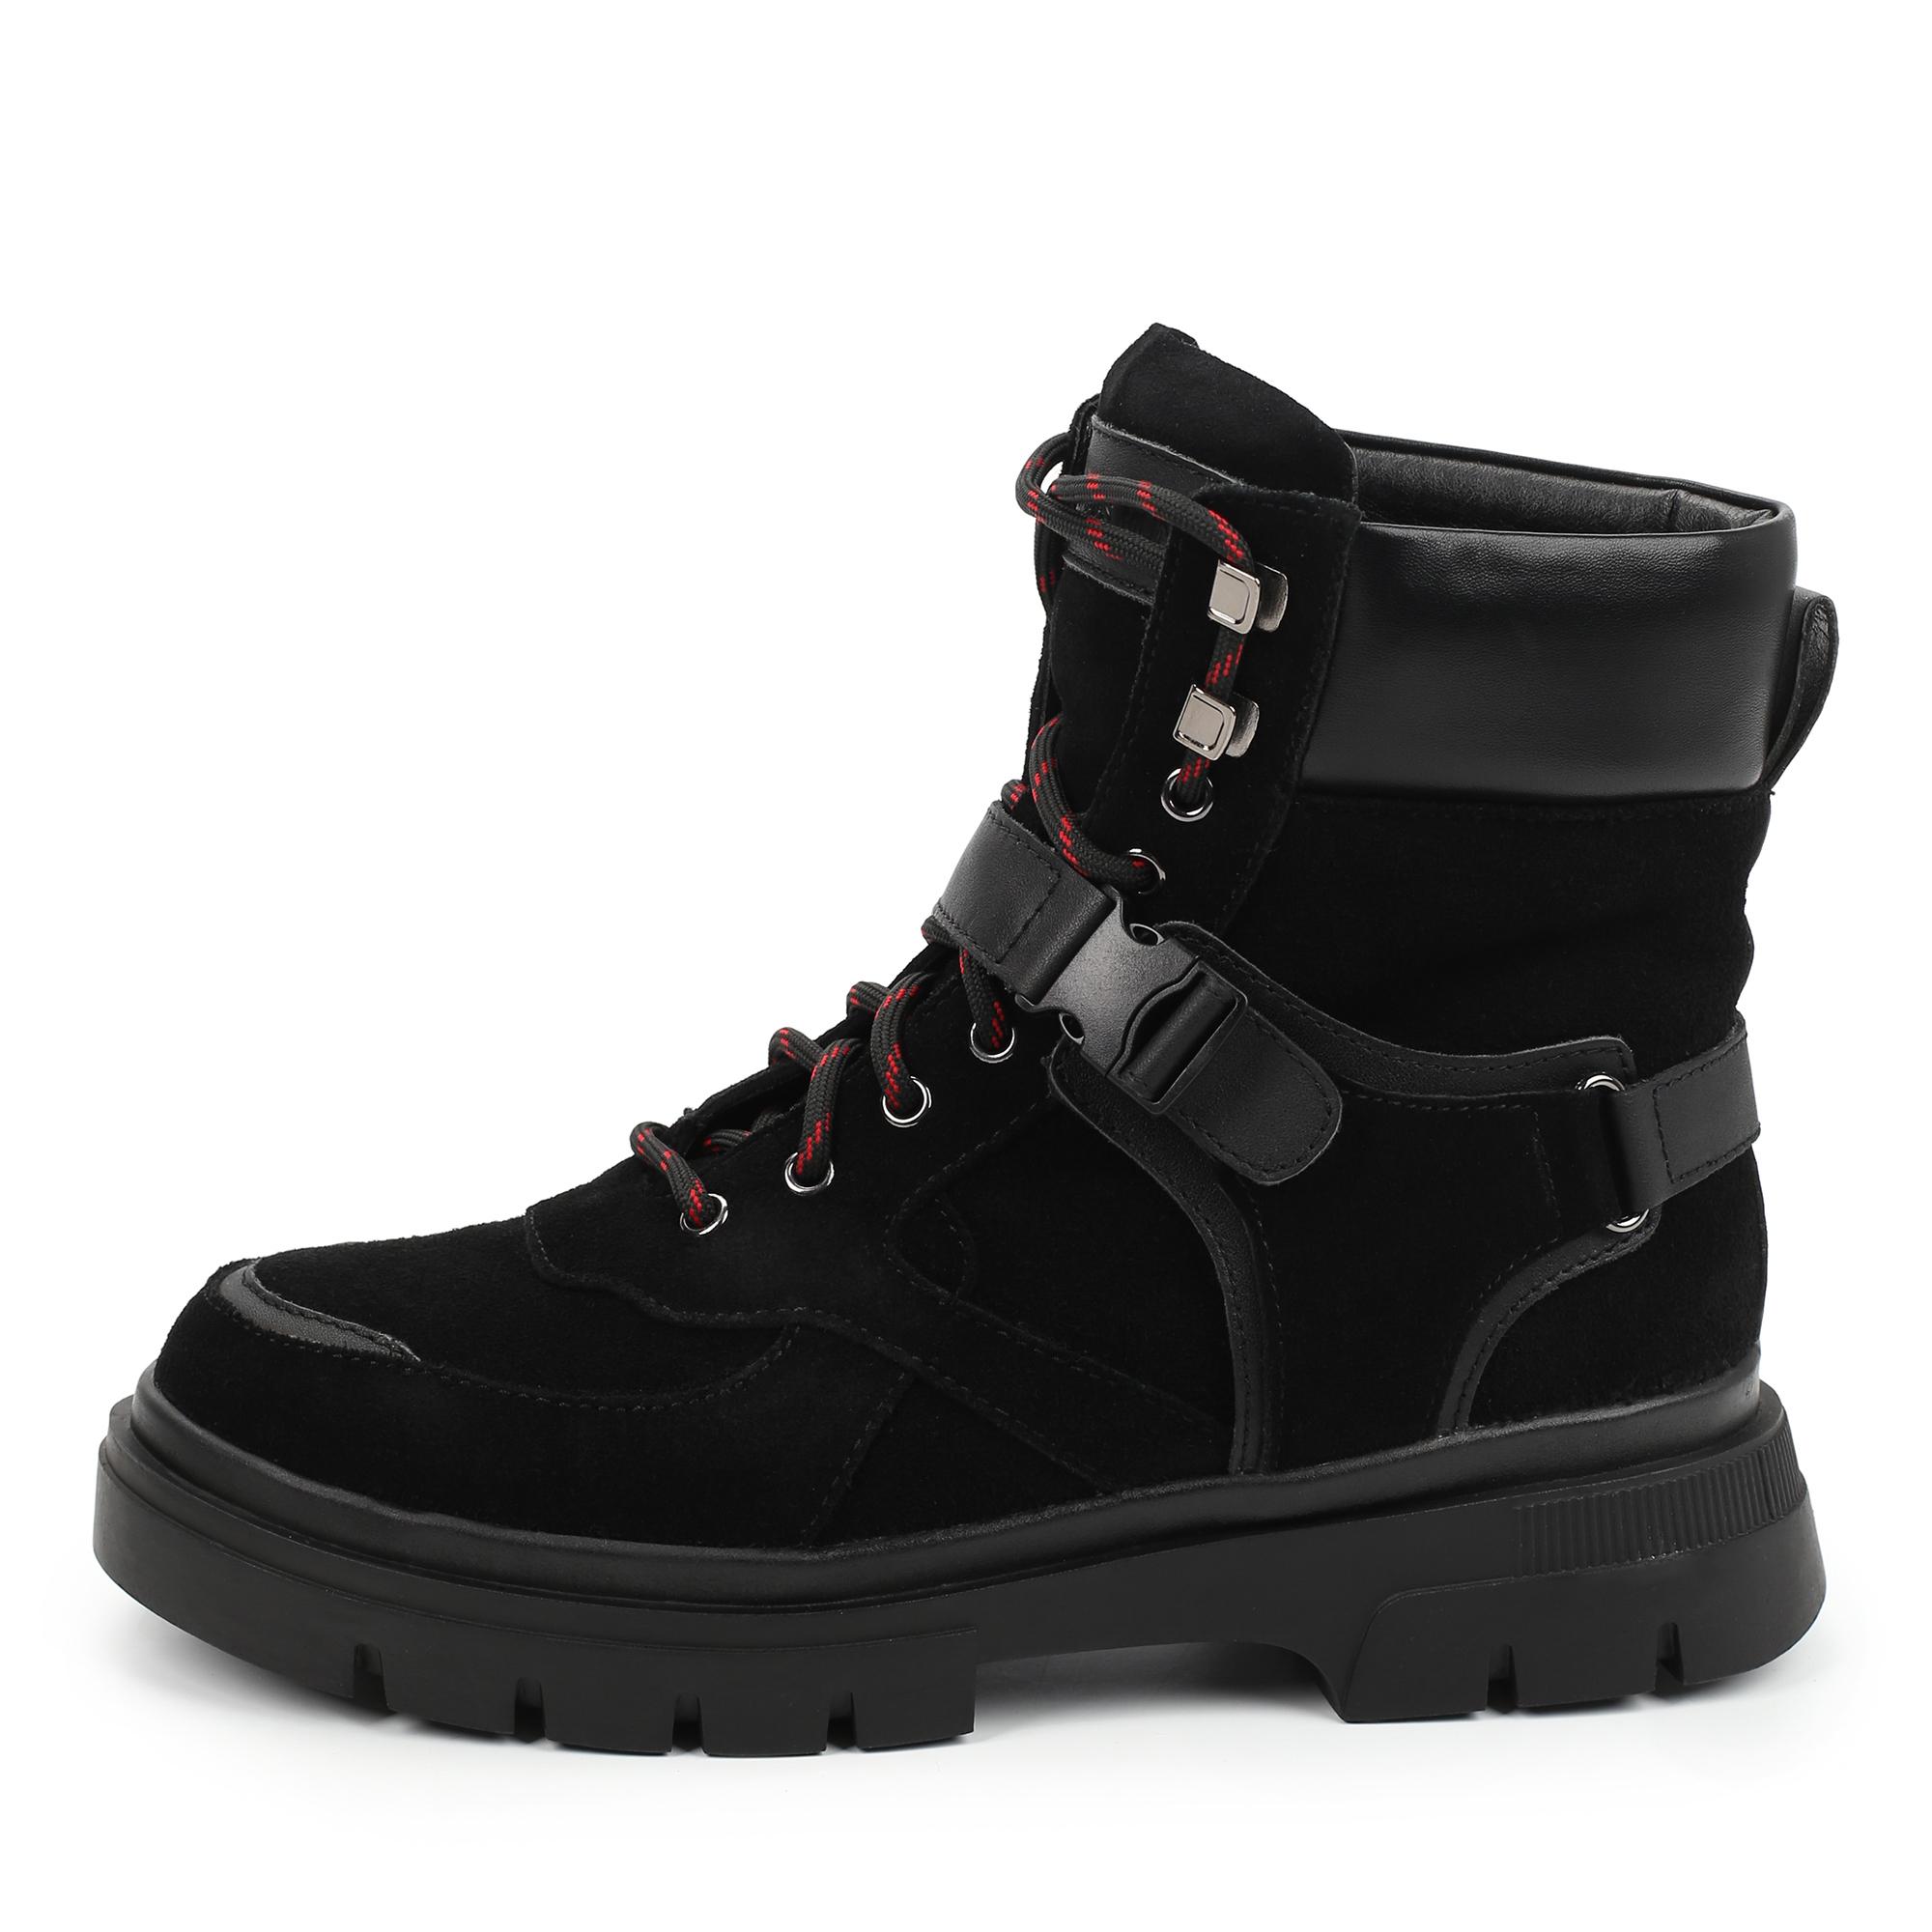 Ботинки Thomas Munz 233-688A-30202